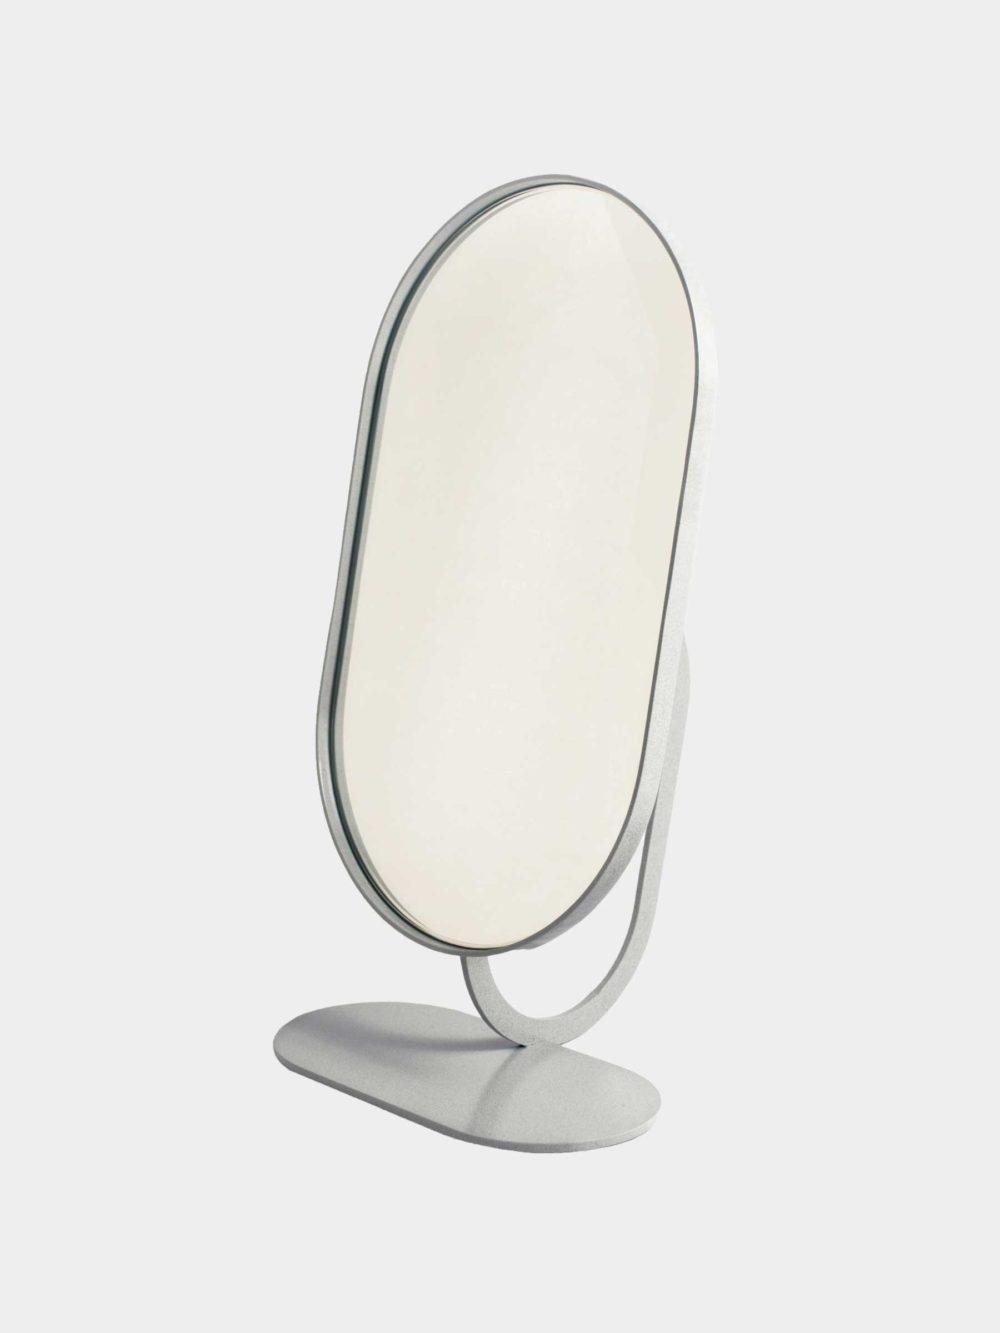 rou_soll_mirror_gray